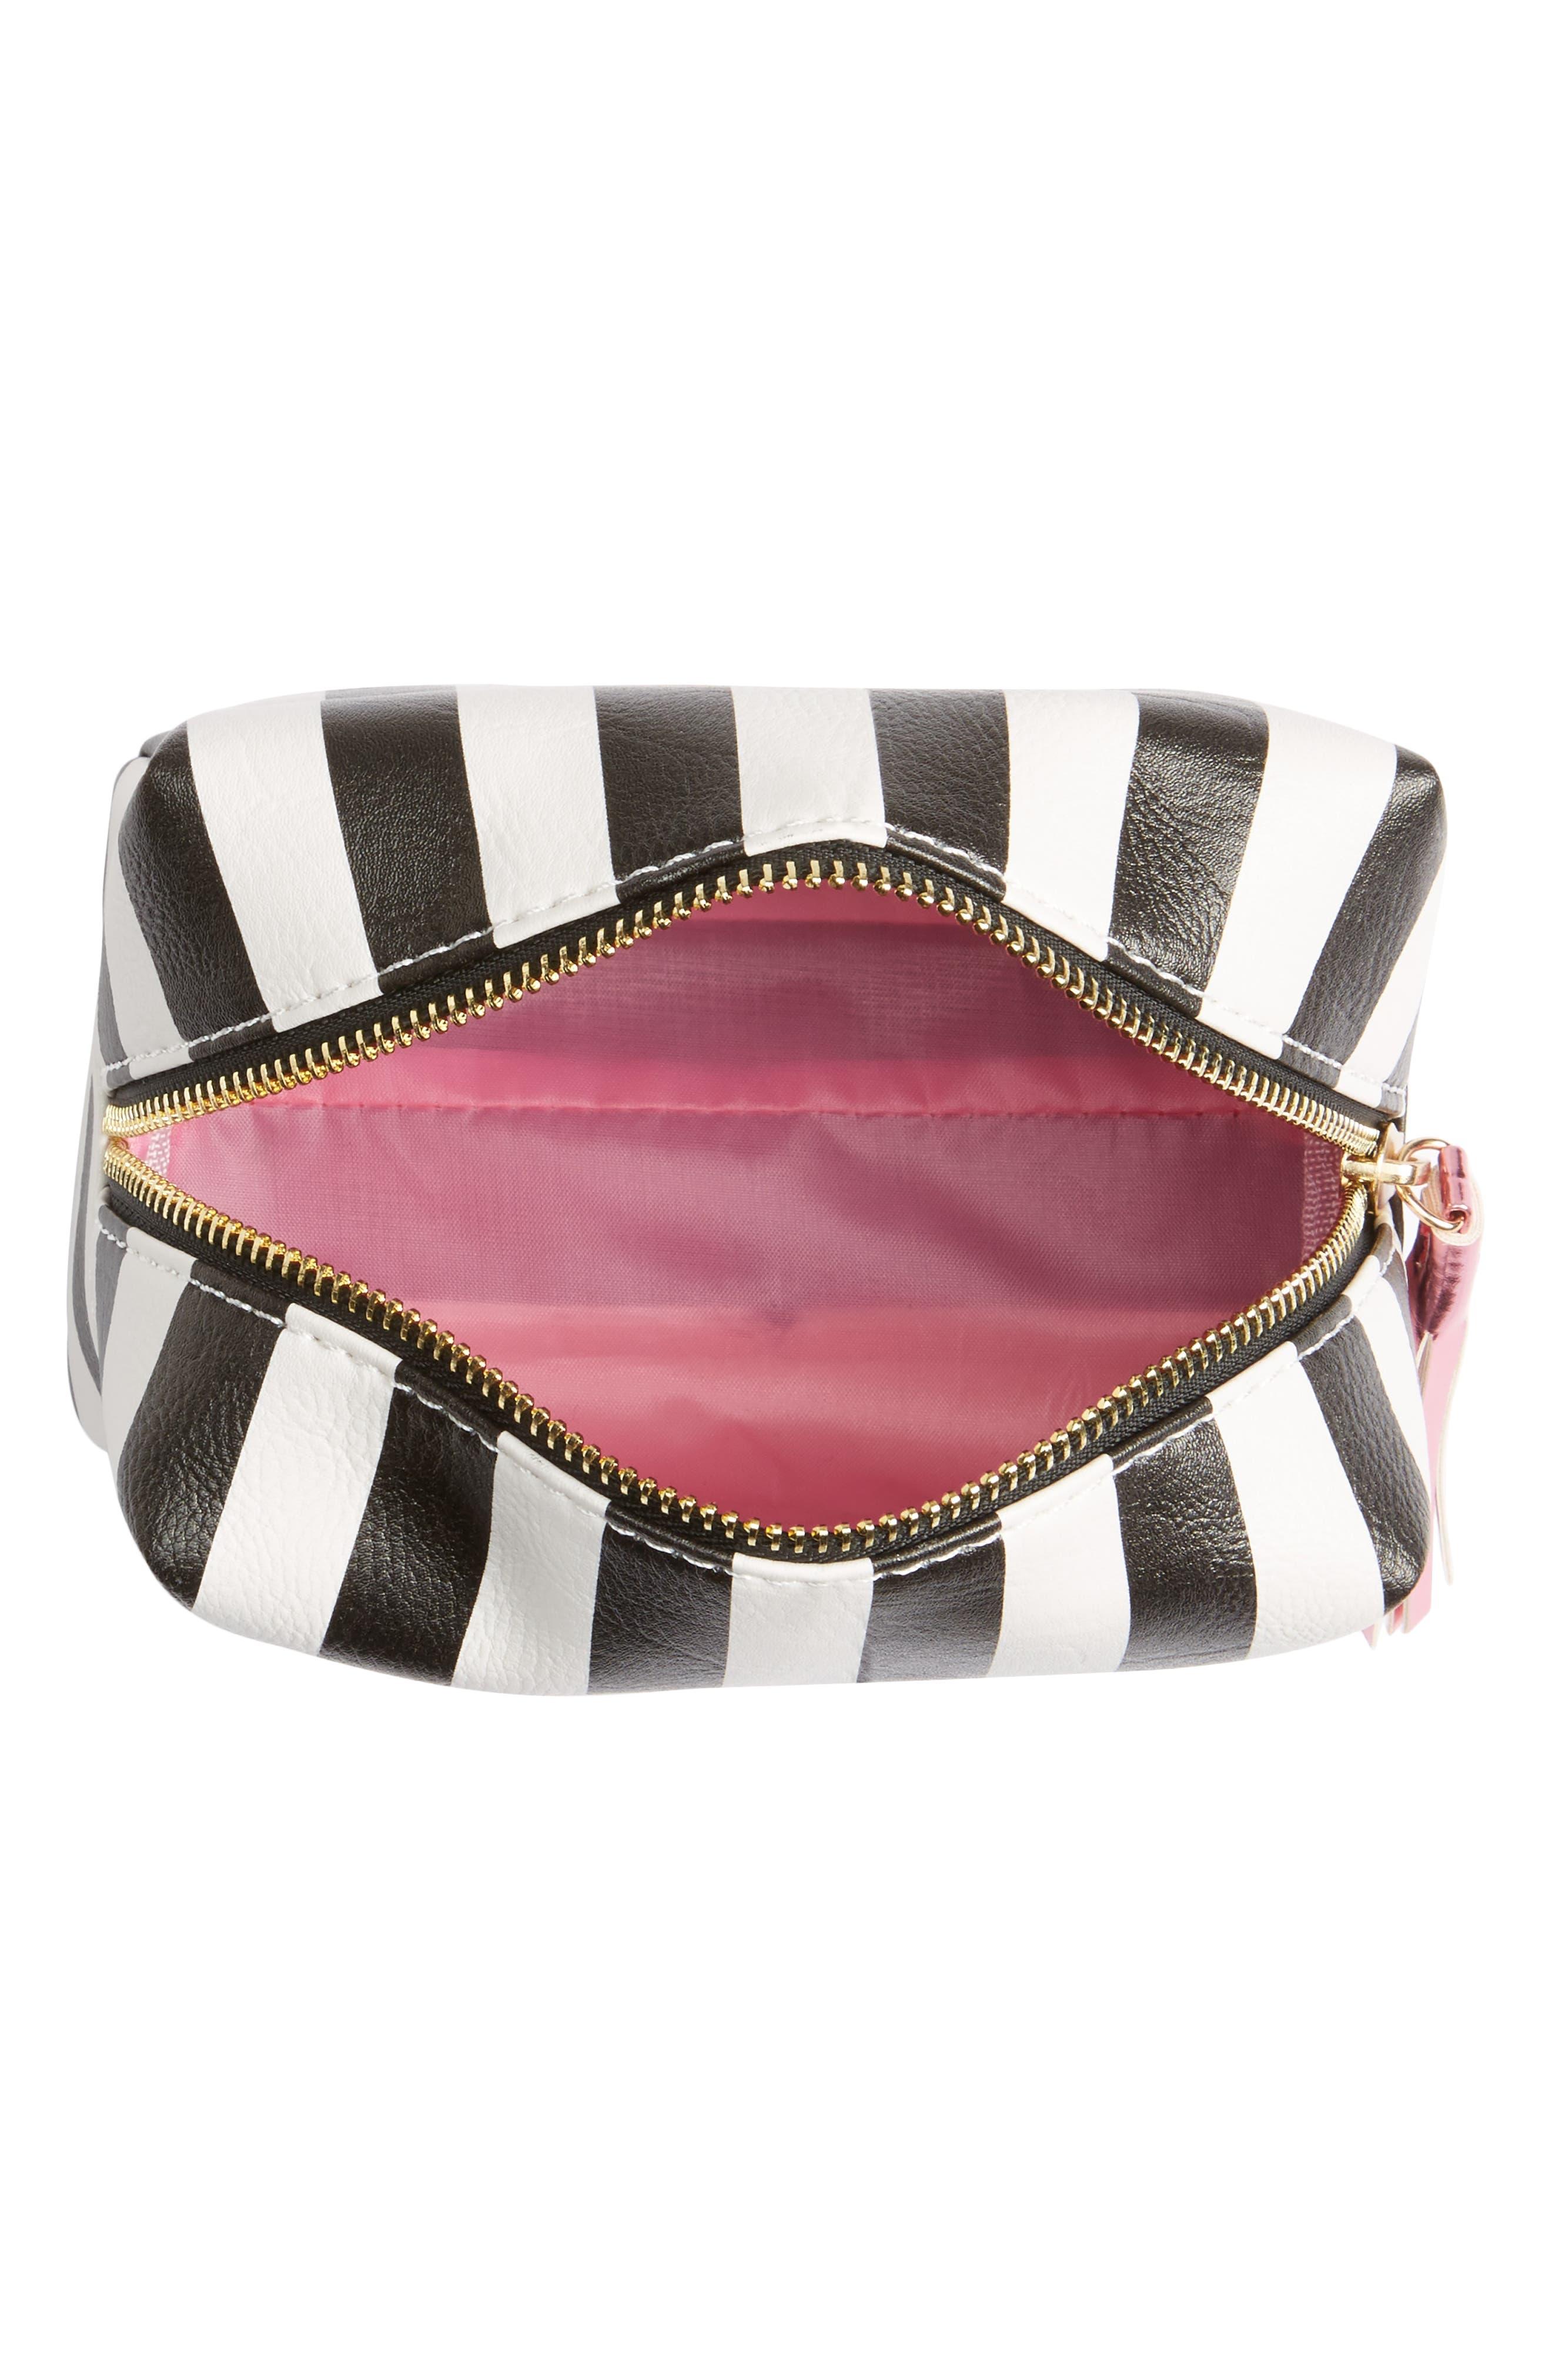 Metallic Lip Stripe Cosmetics Bag,                             Alternate thumbnail 3, color,                             Black/ White